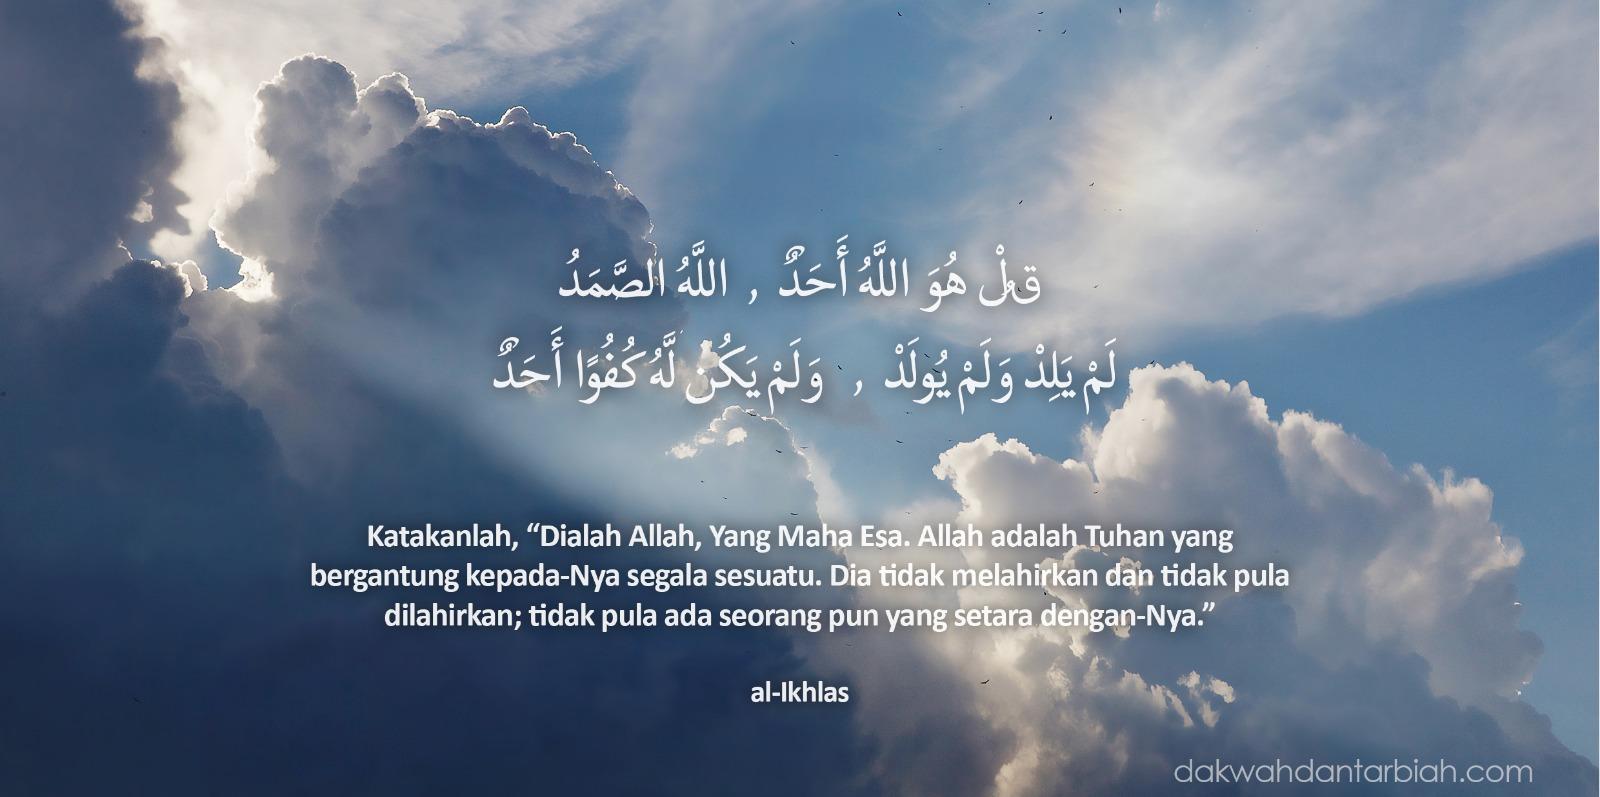 Photo of Ringkasan Tafsir Surah Al-Ikhlas (Surah 112)